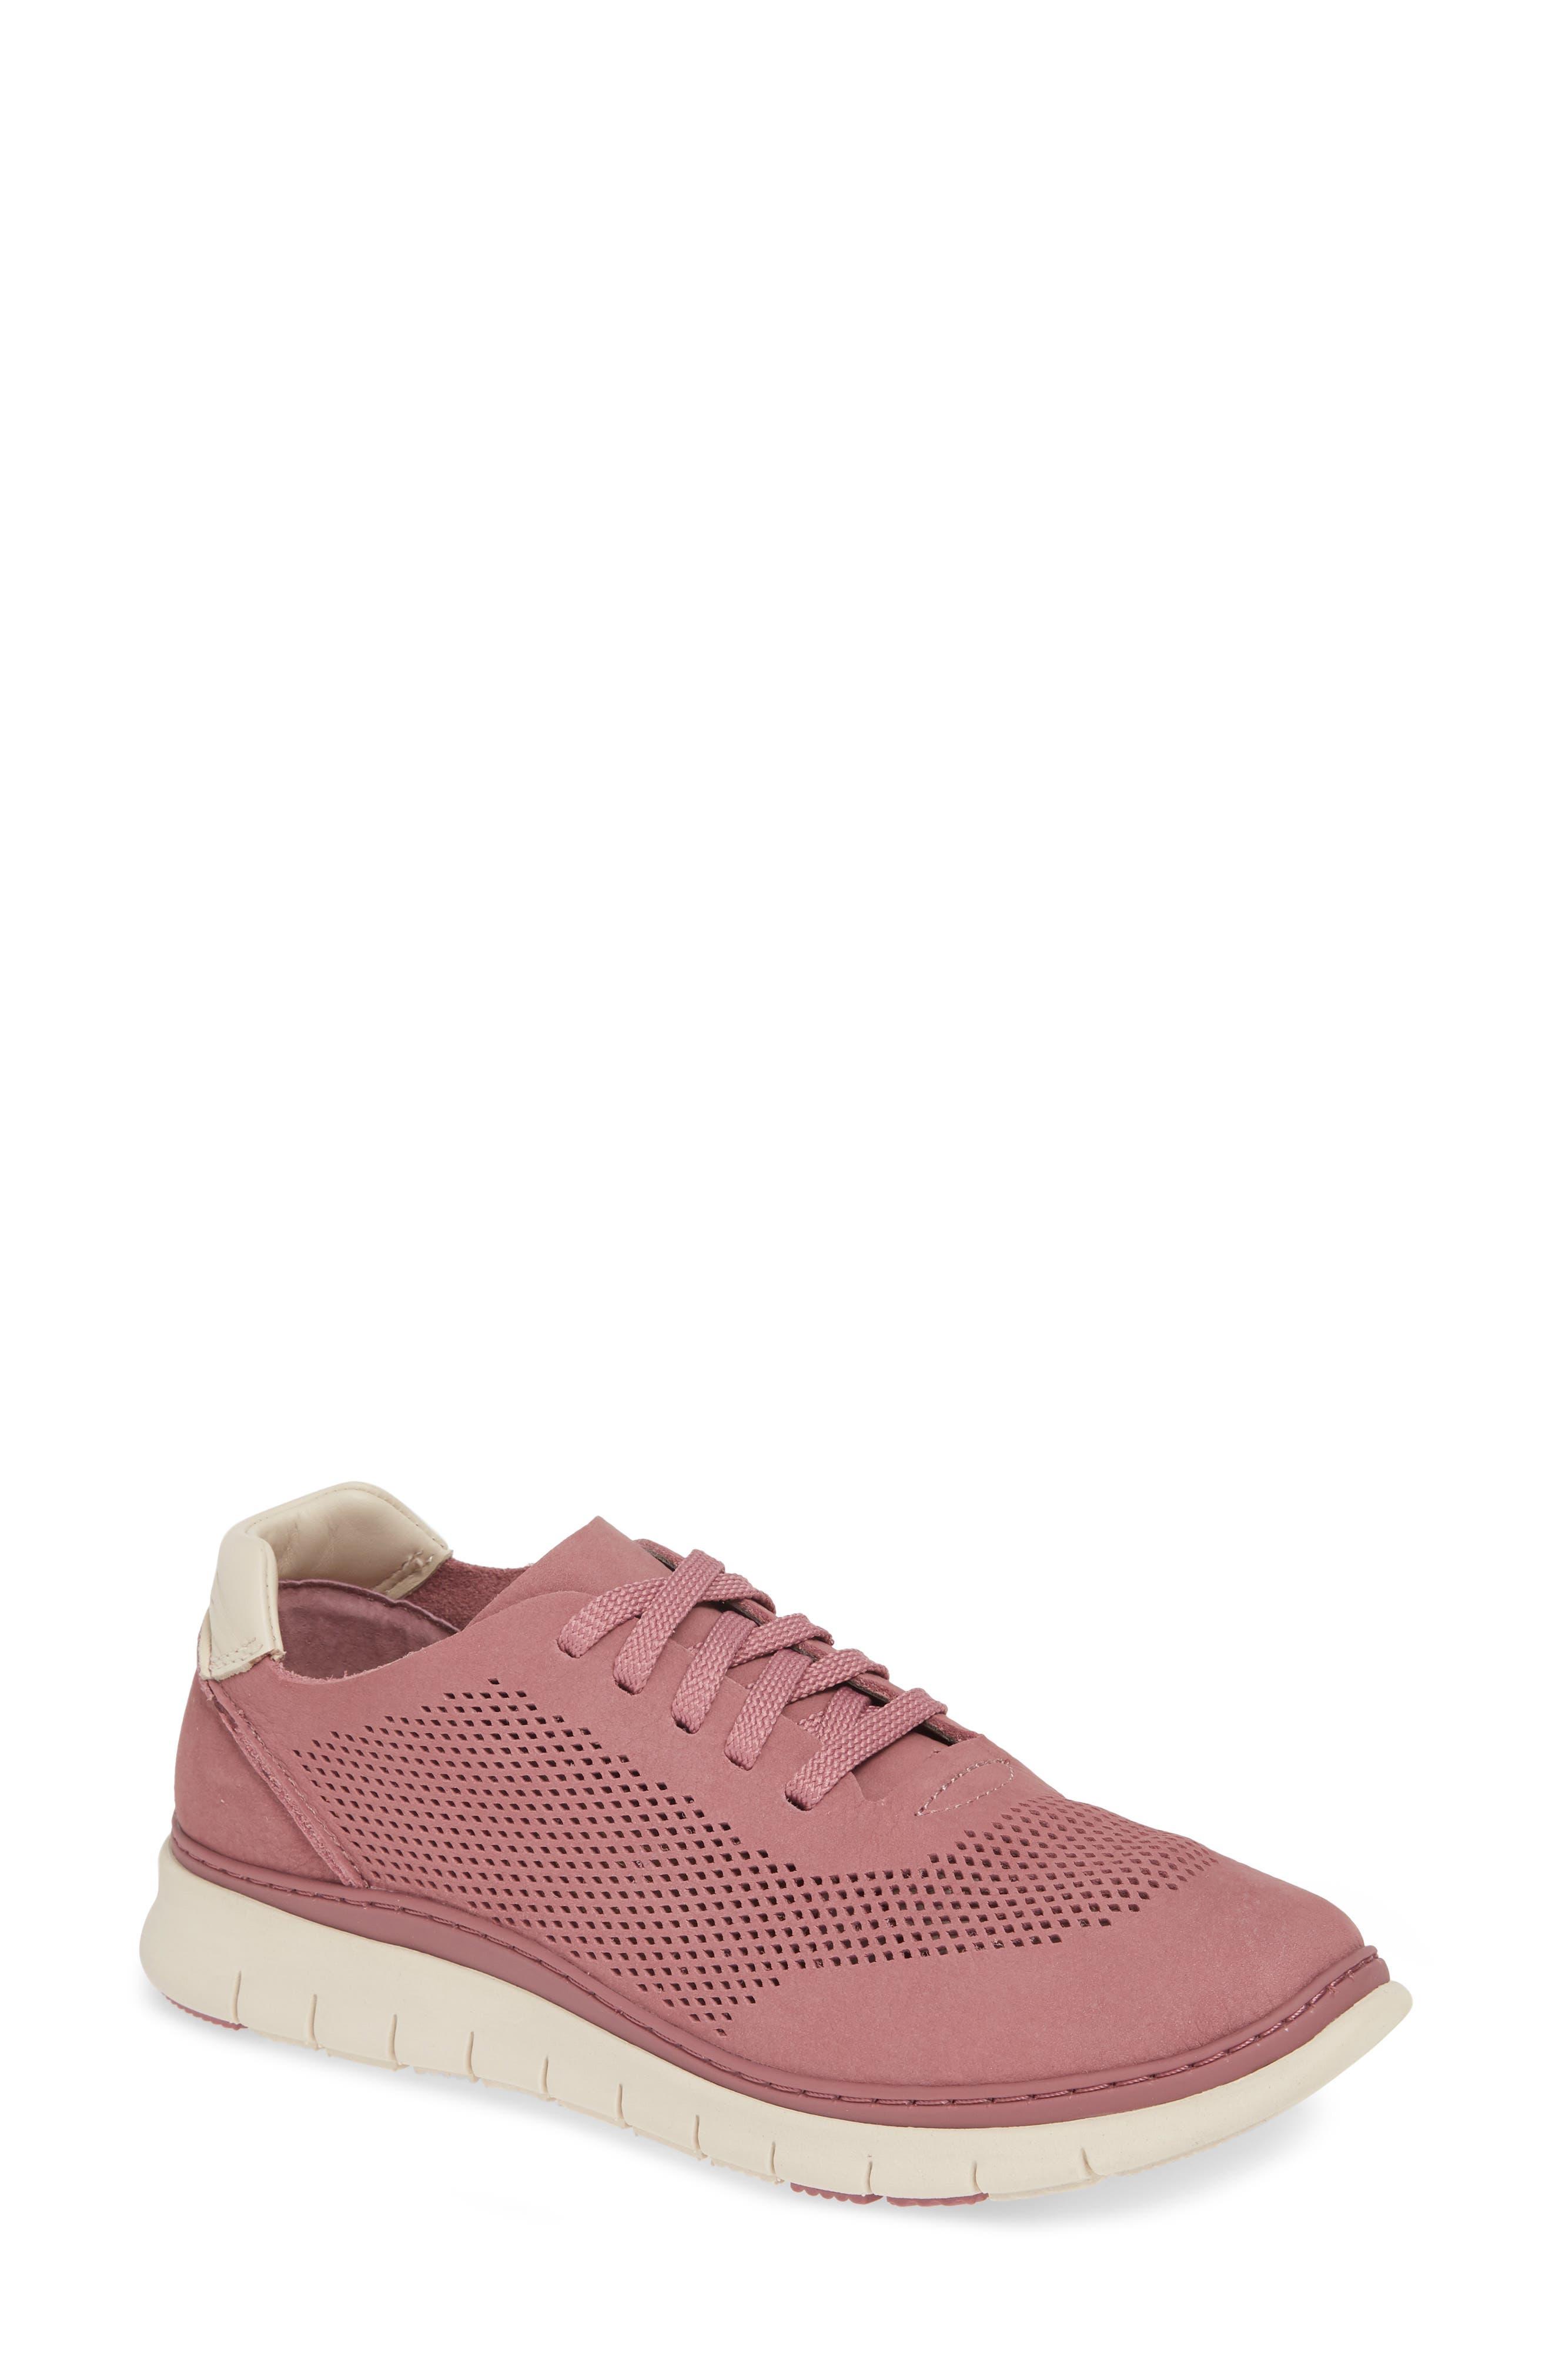 Vionic Joey Sneaker, Pink